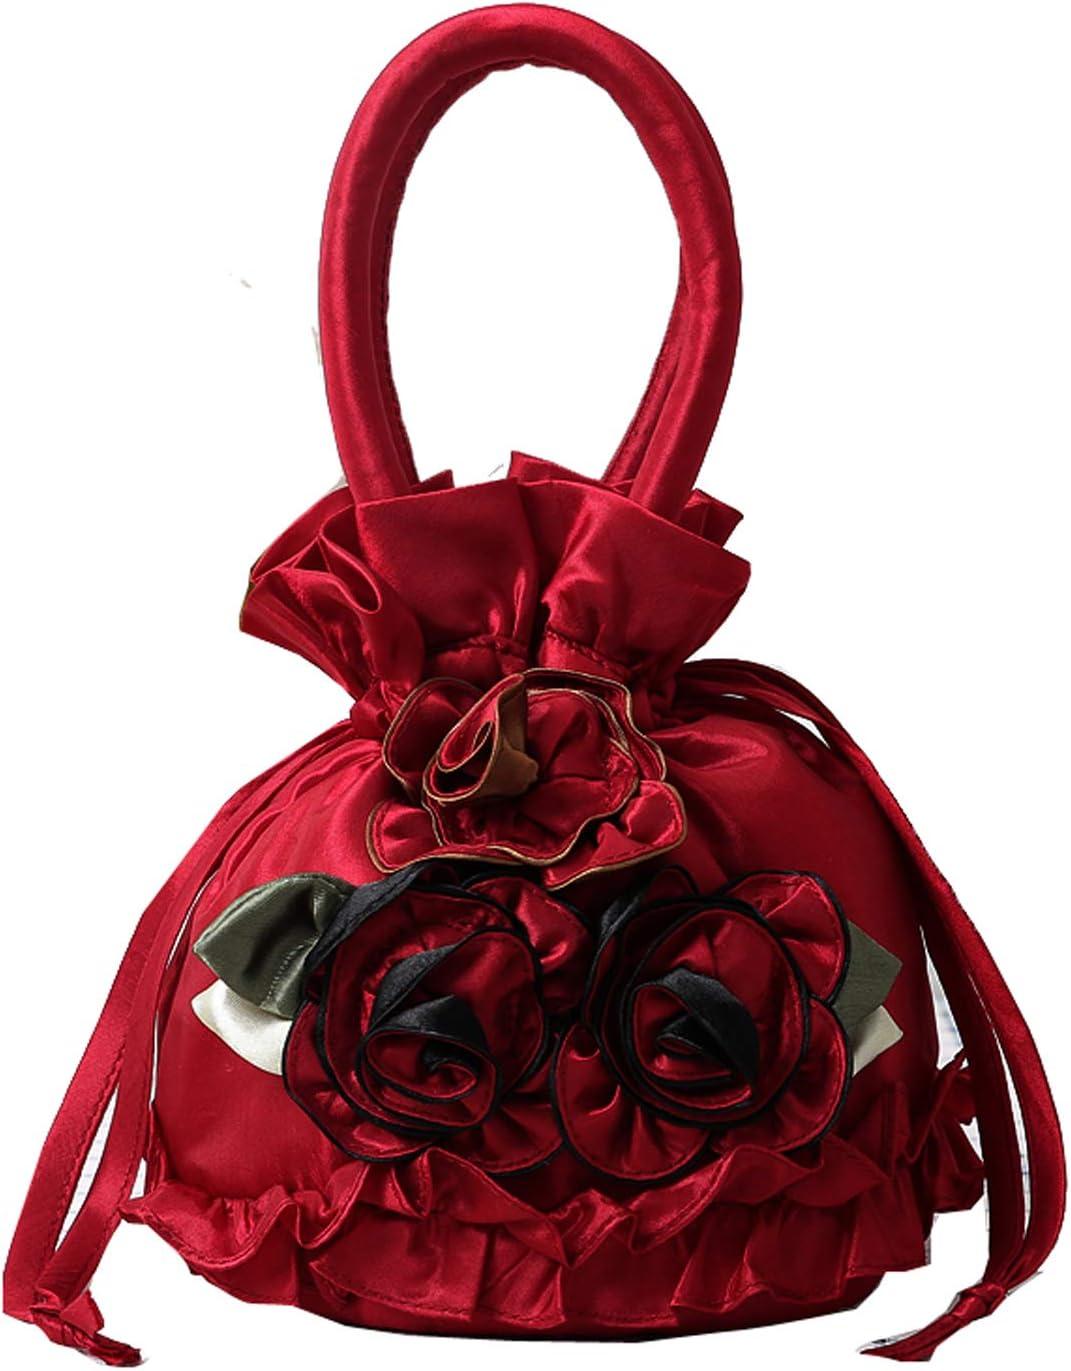 Puyang Womens Vintage Floral Handbag Drawstring Bucket Bag Ladies Polyester Silk Coin Purses Key Bags Cash Money Phone Pouches Black